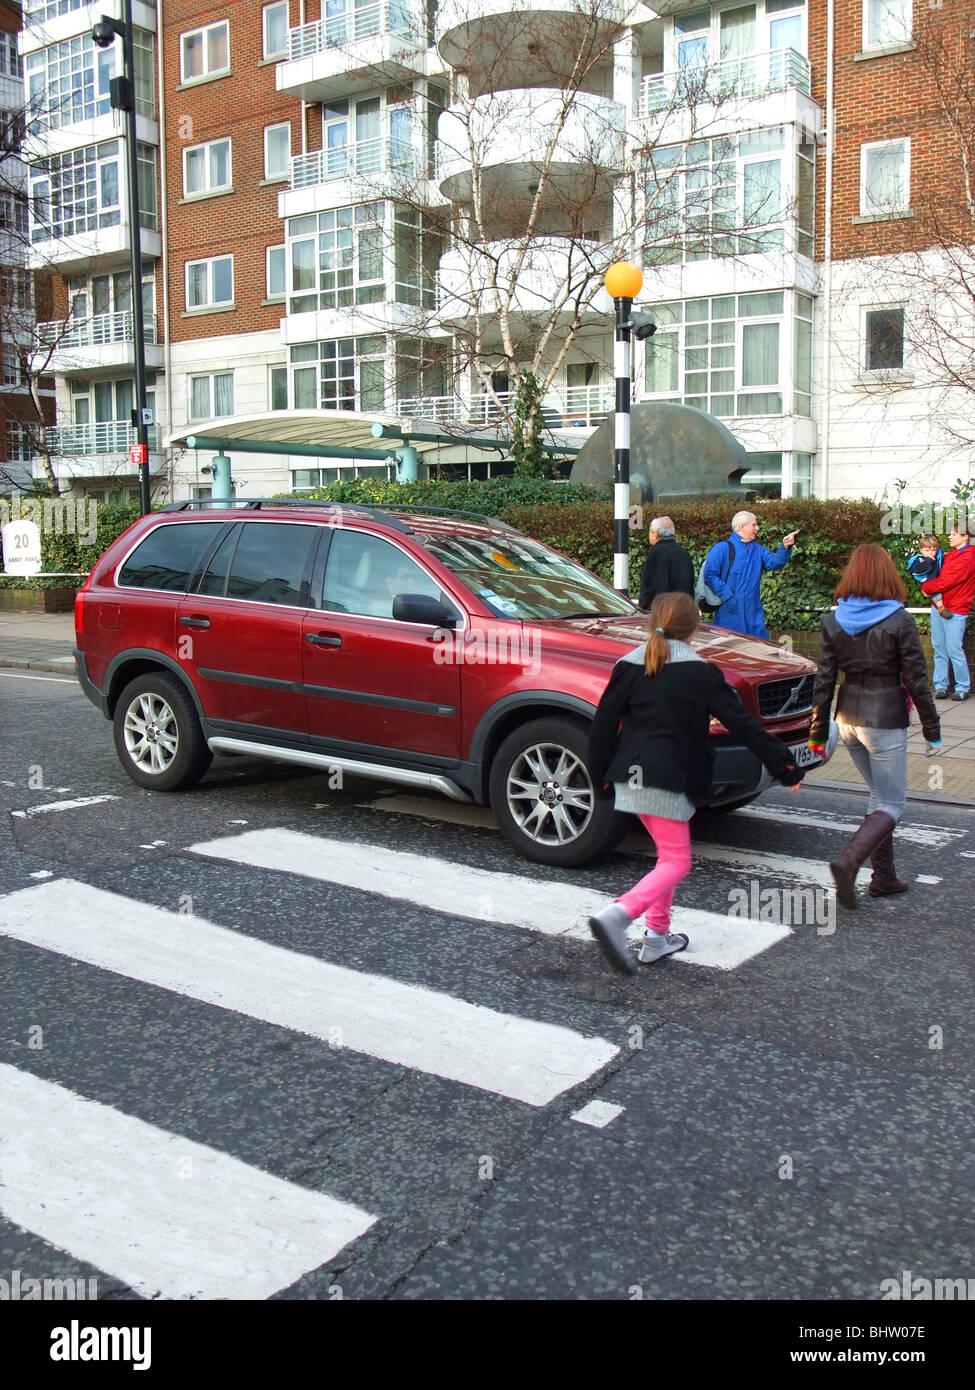 uk england london zebra crossing Stock Photo